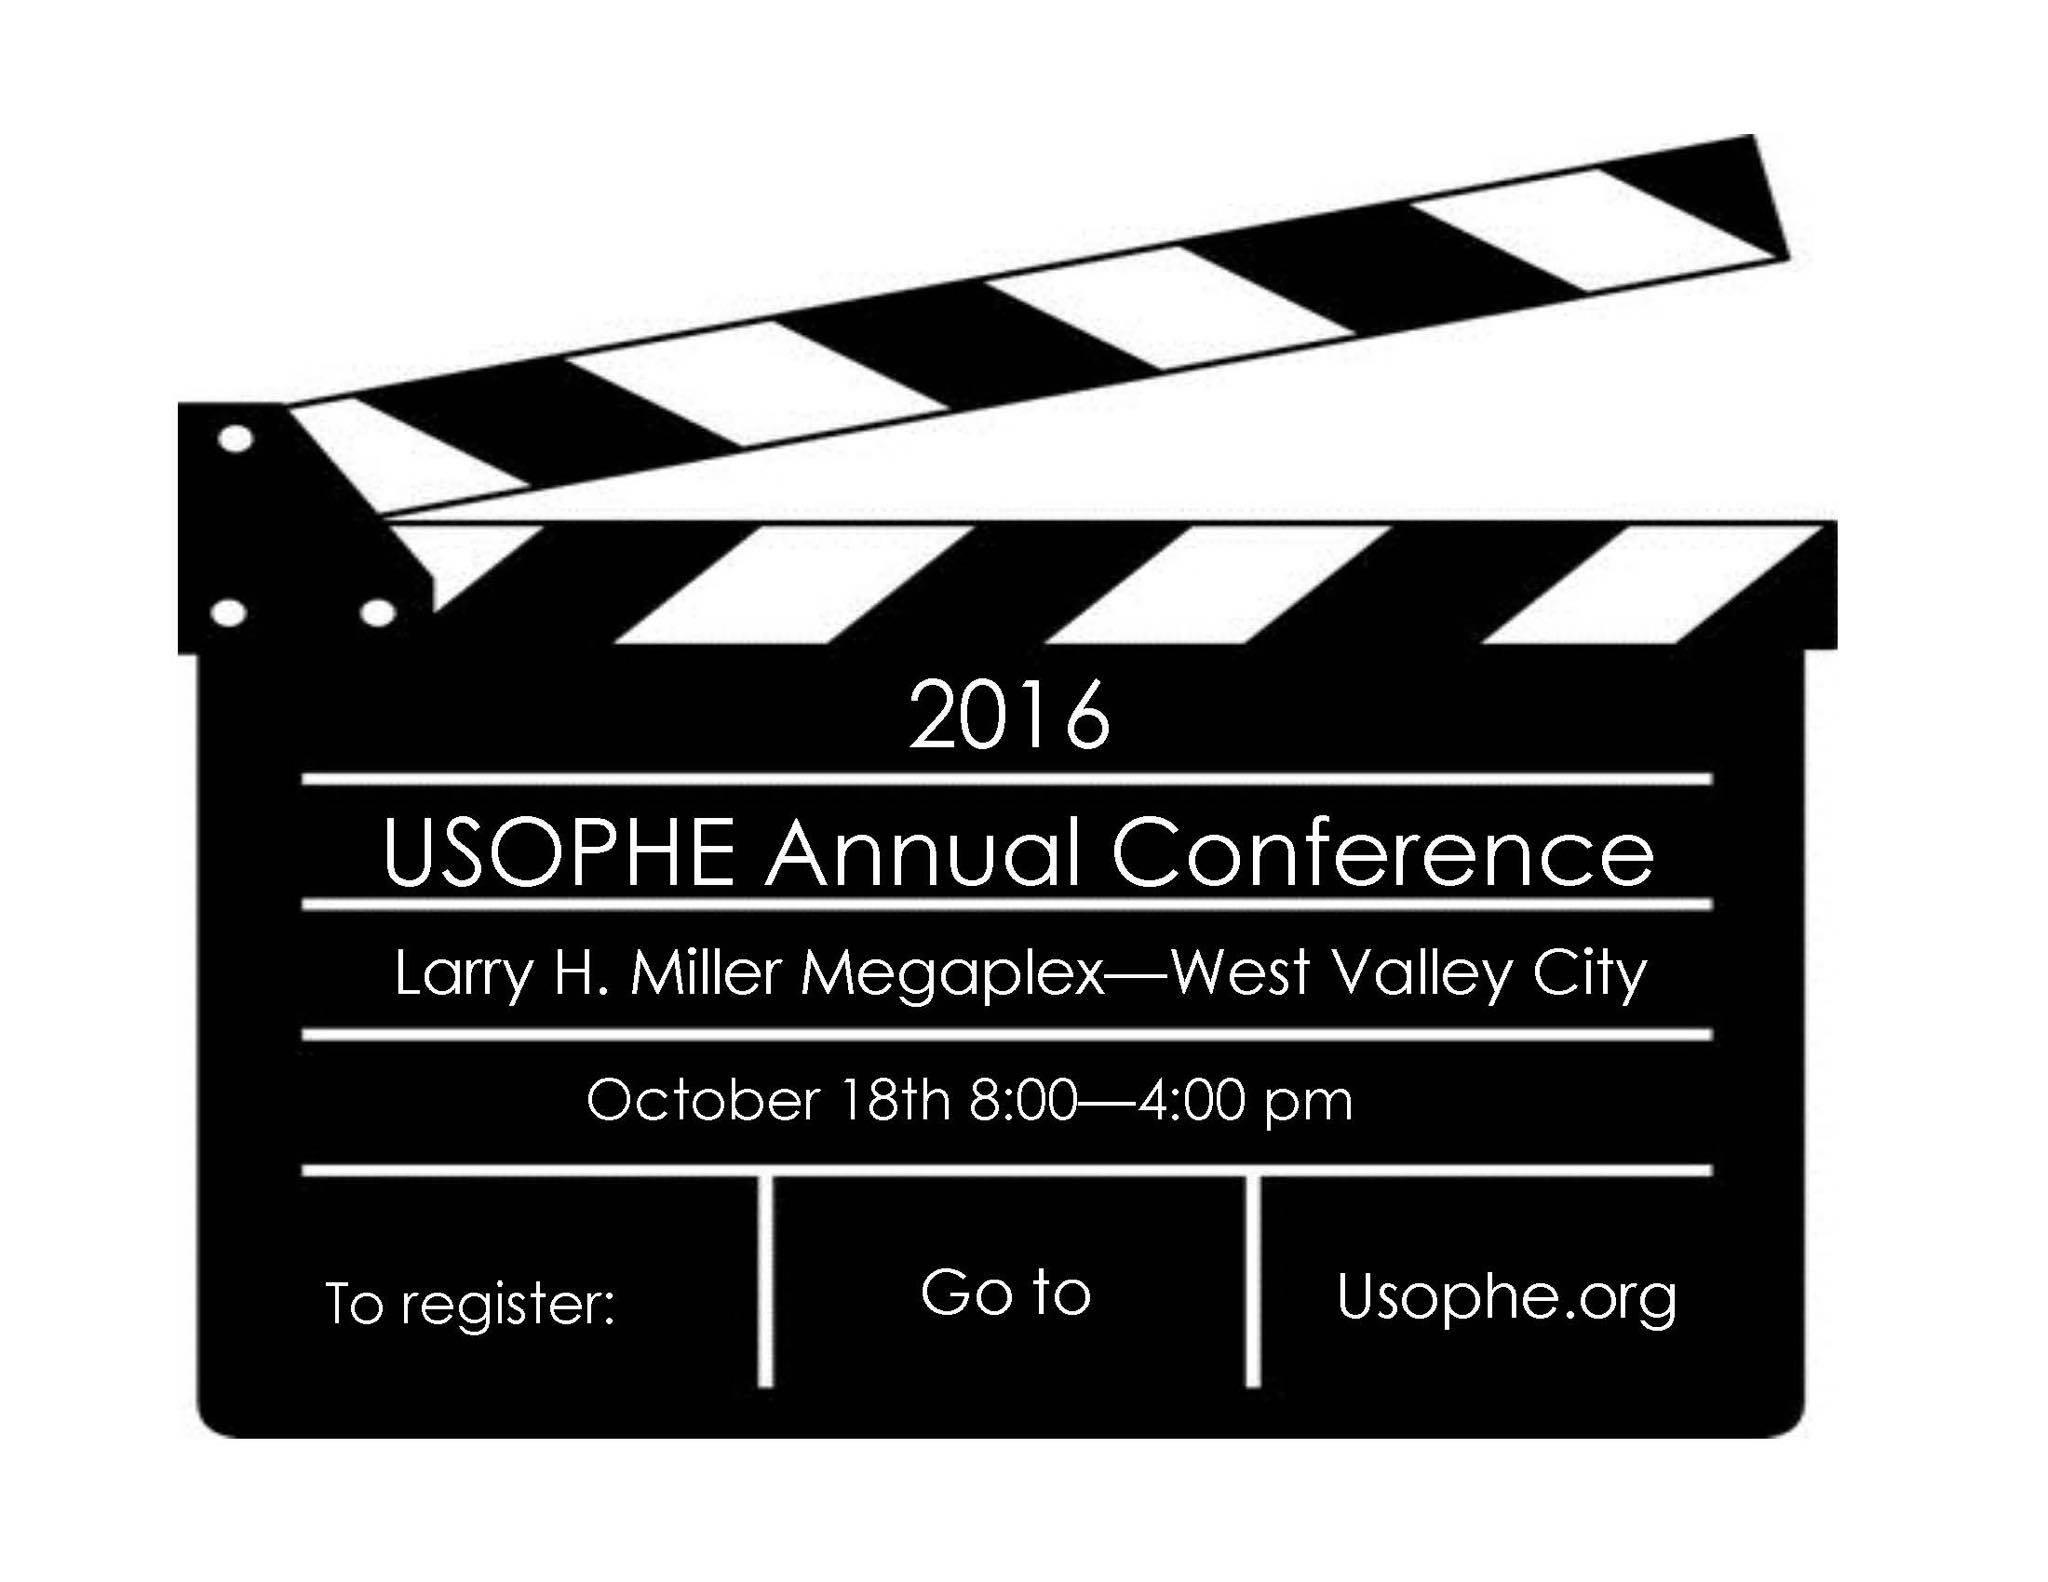 2016 USOPHE Conference